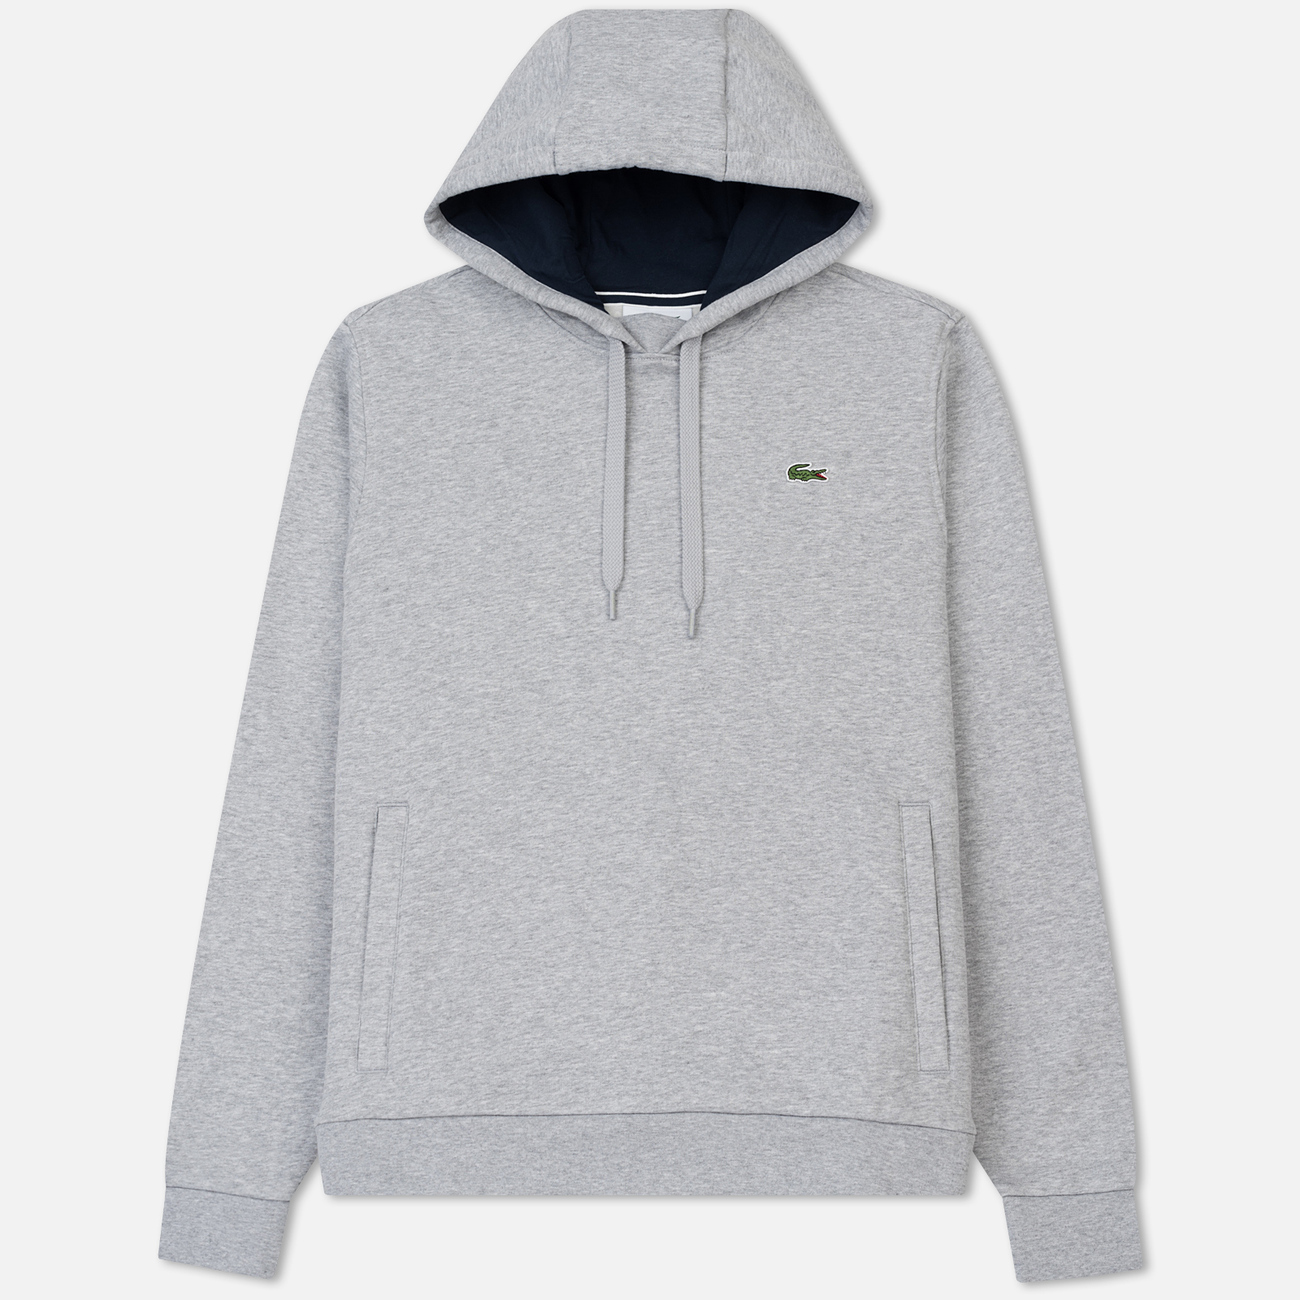 Мужская толстовка Lacoste Sport Hooded Fleece Tennis Silver/Navy Blue